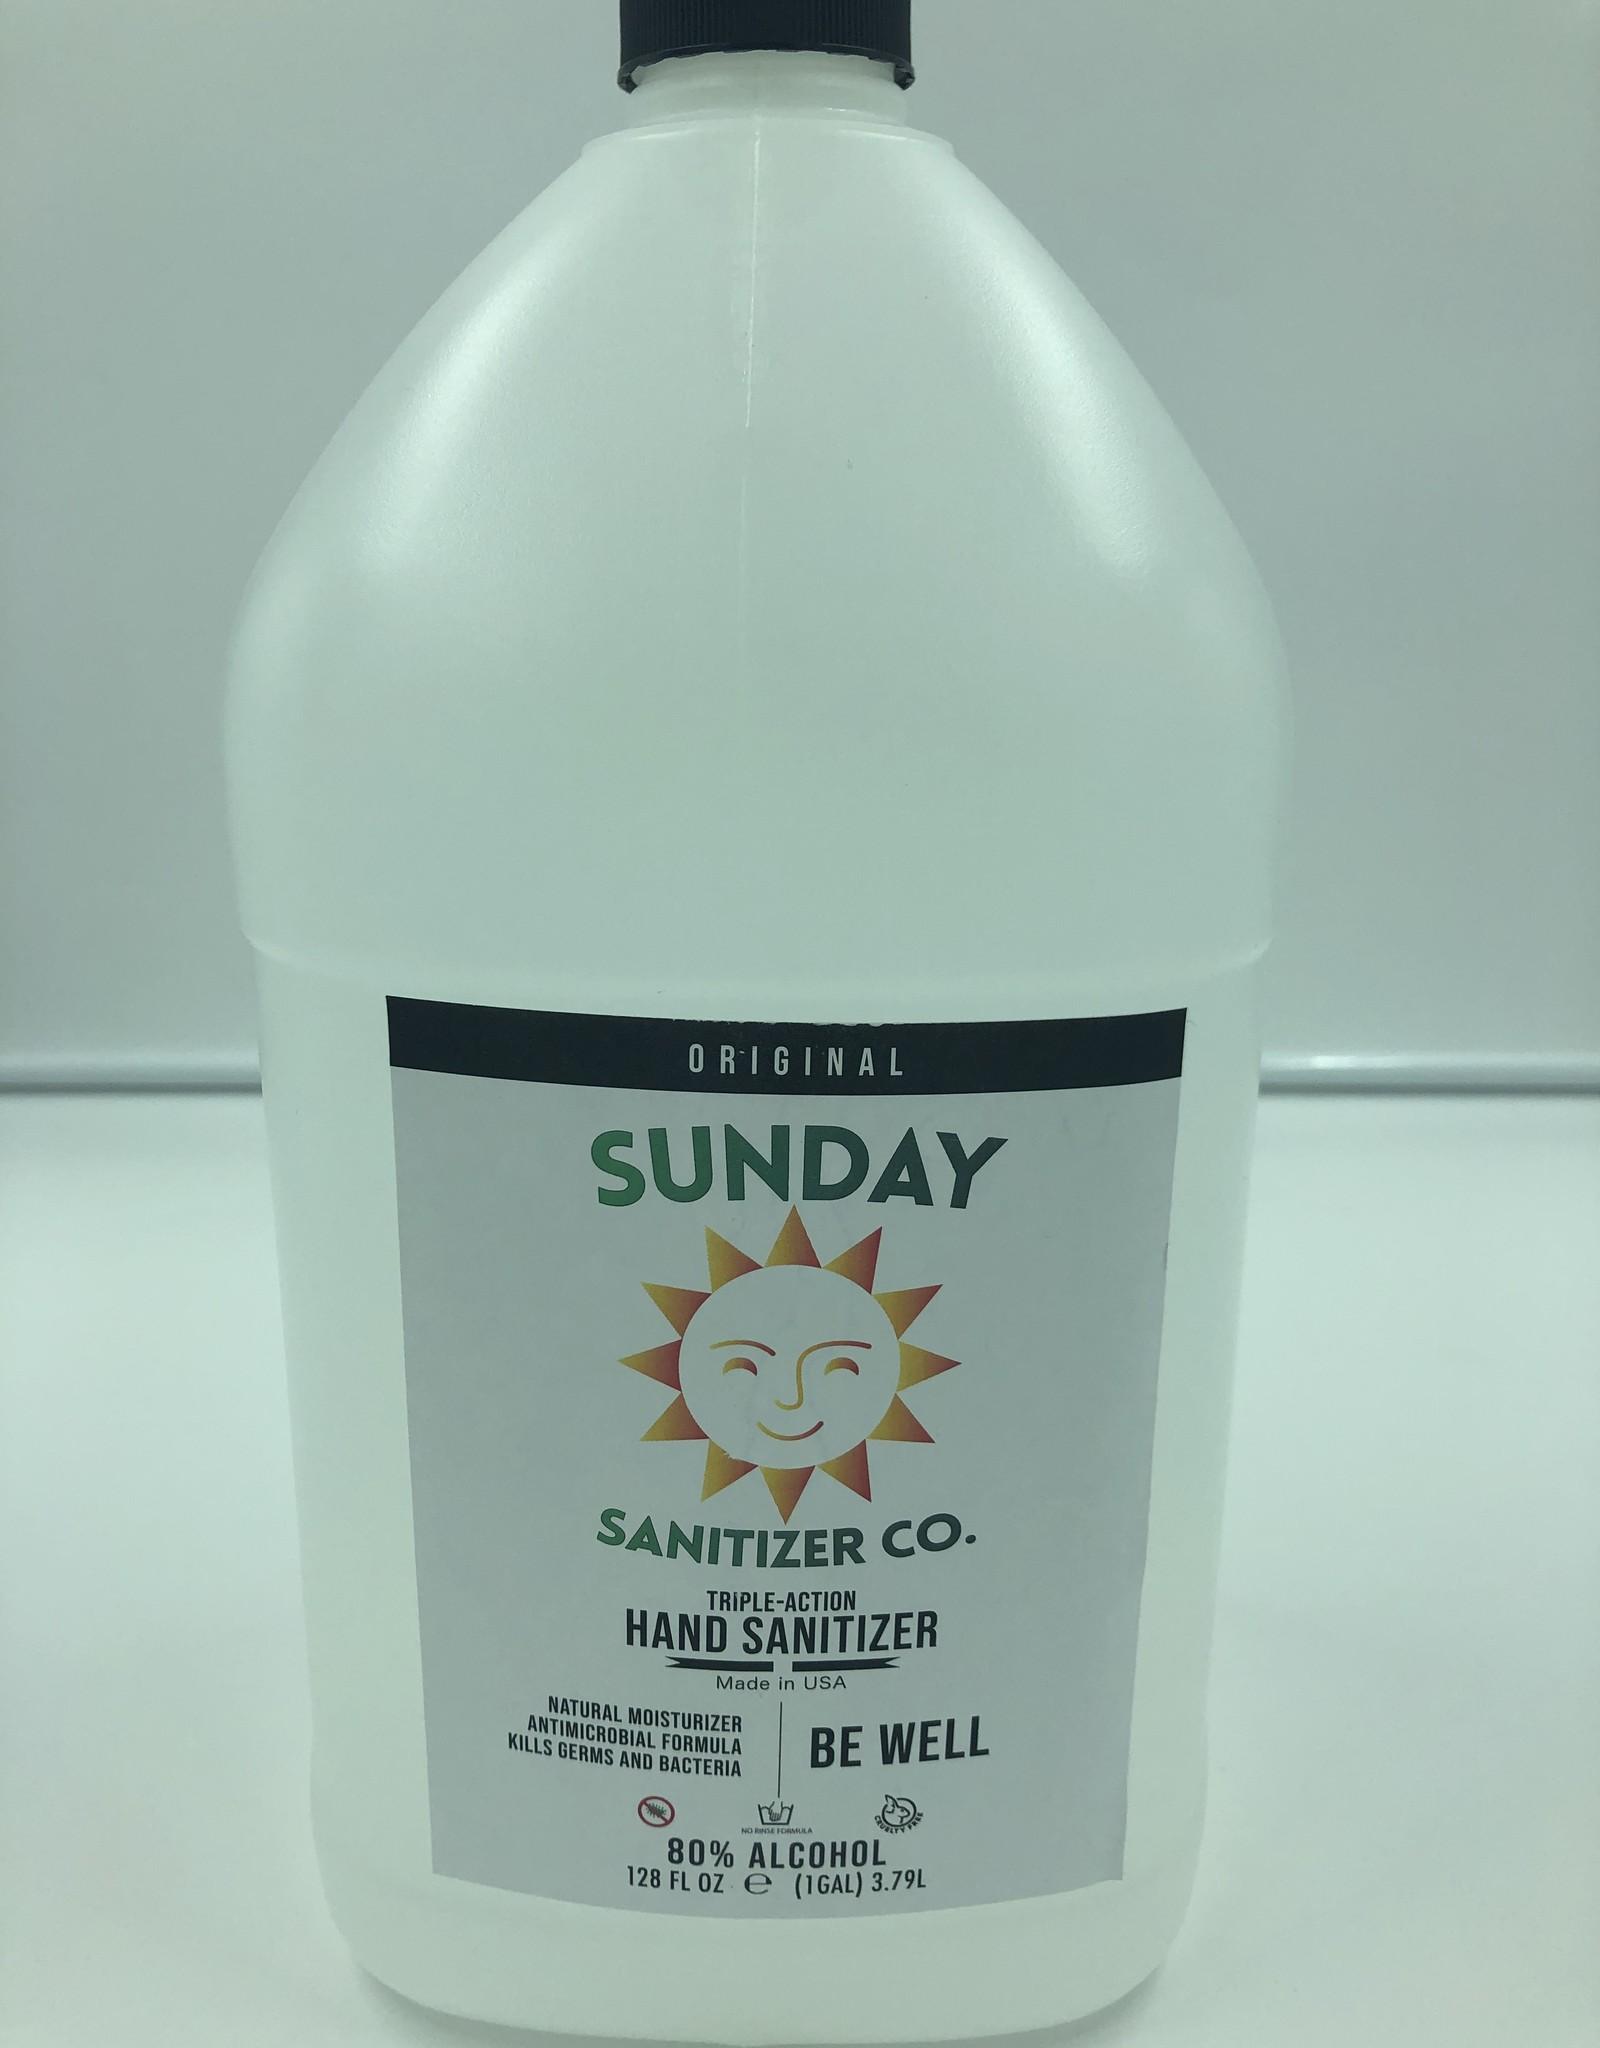 Sunday Sanitizer Co Hand Sanitizer 1 Gallon by Sunday Sanitizer